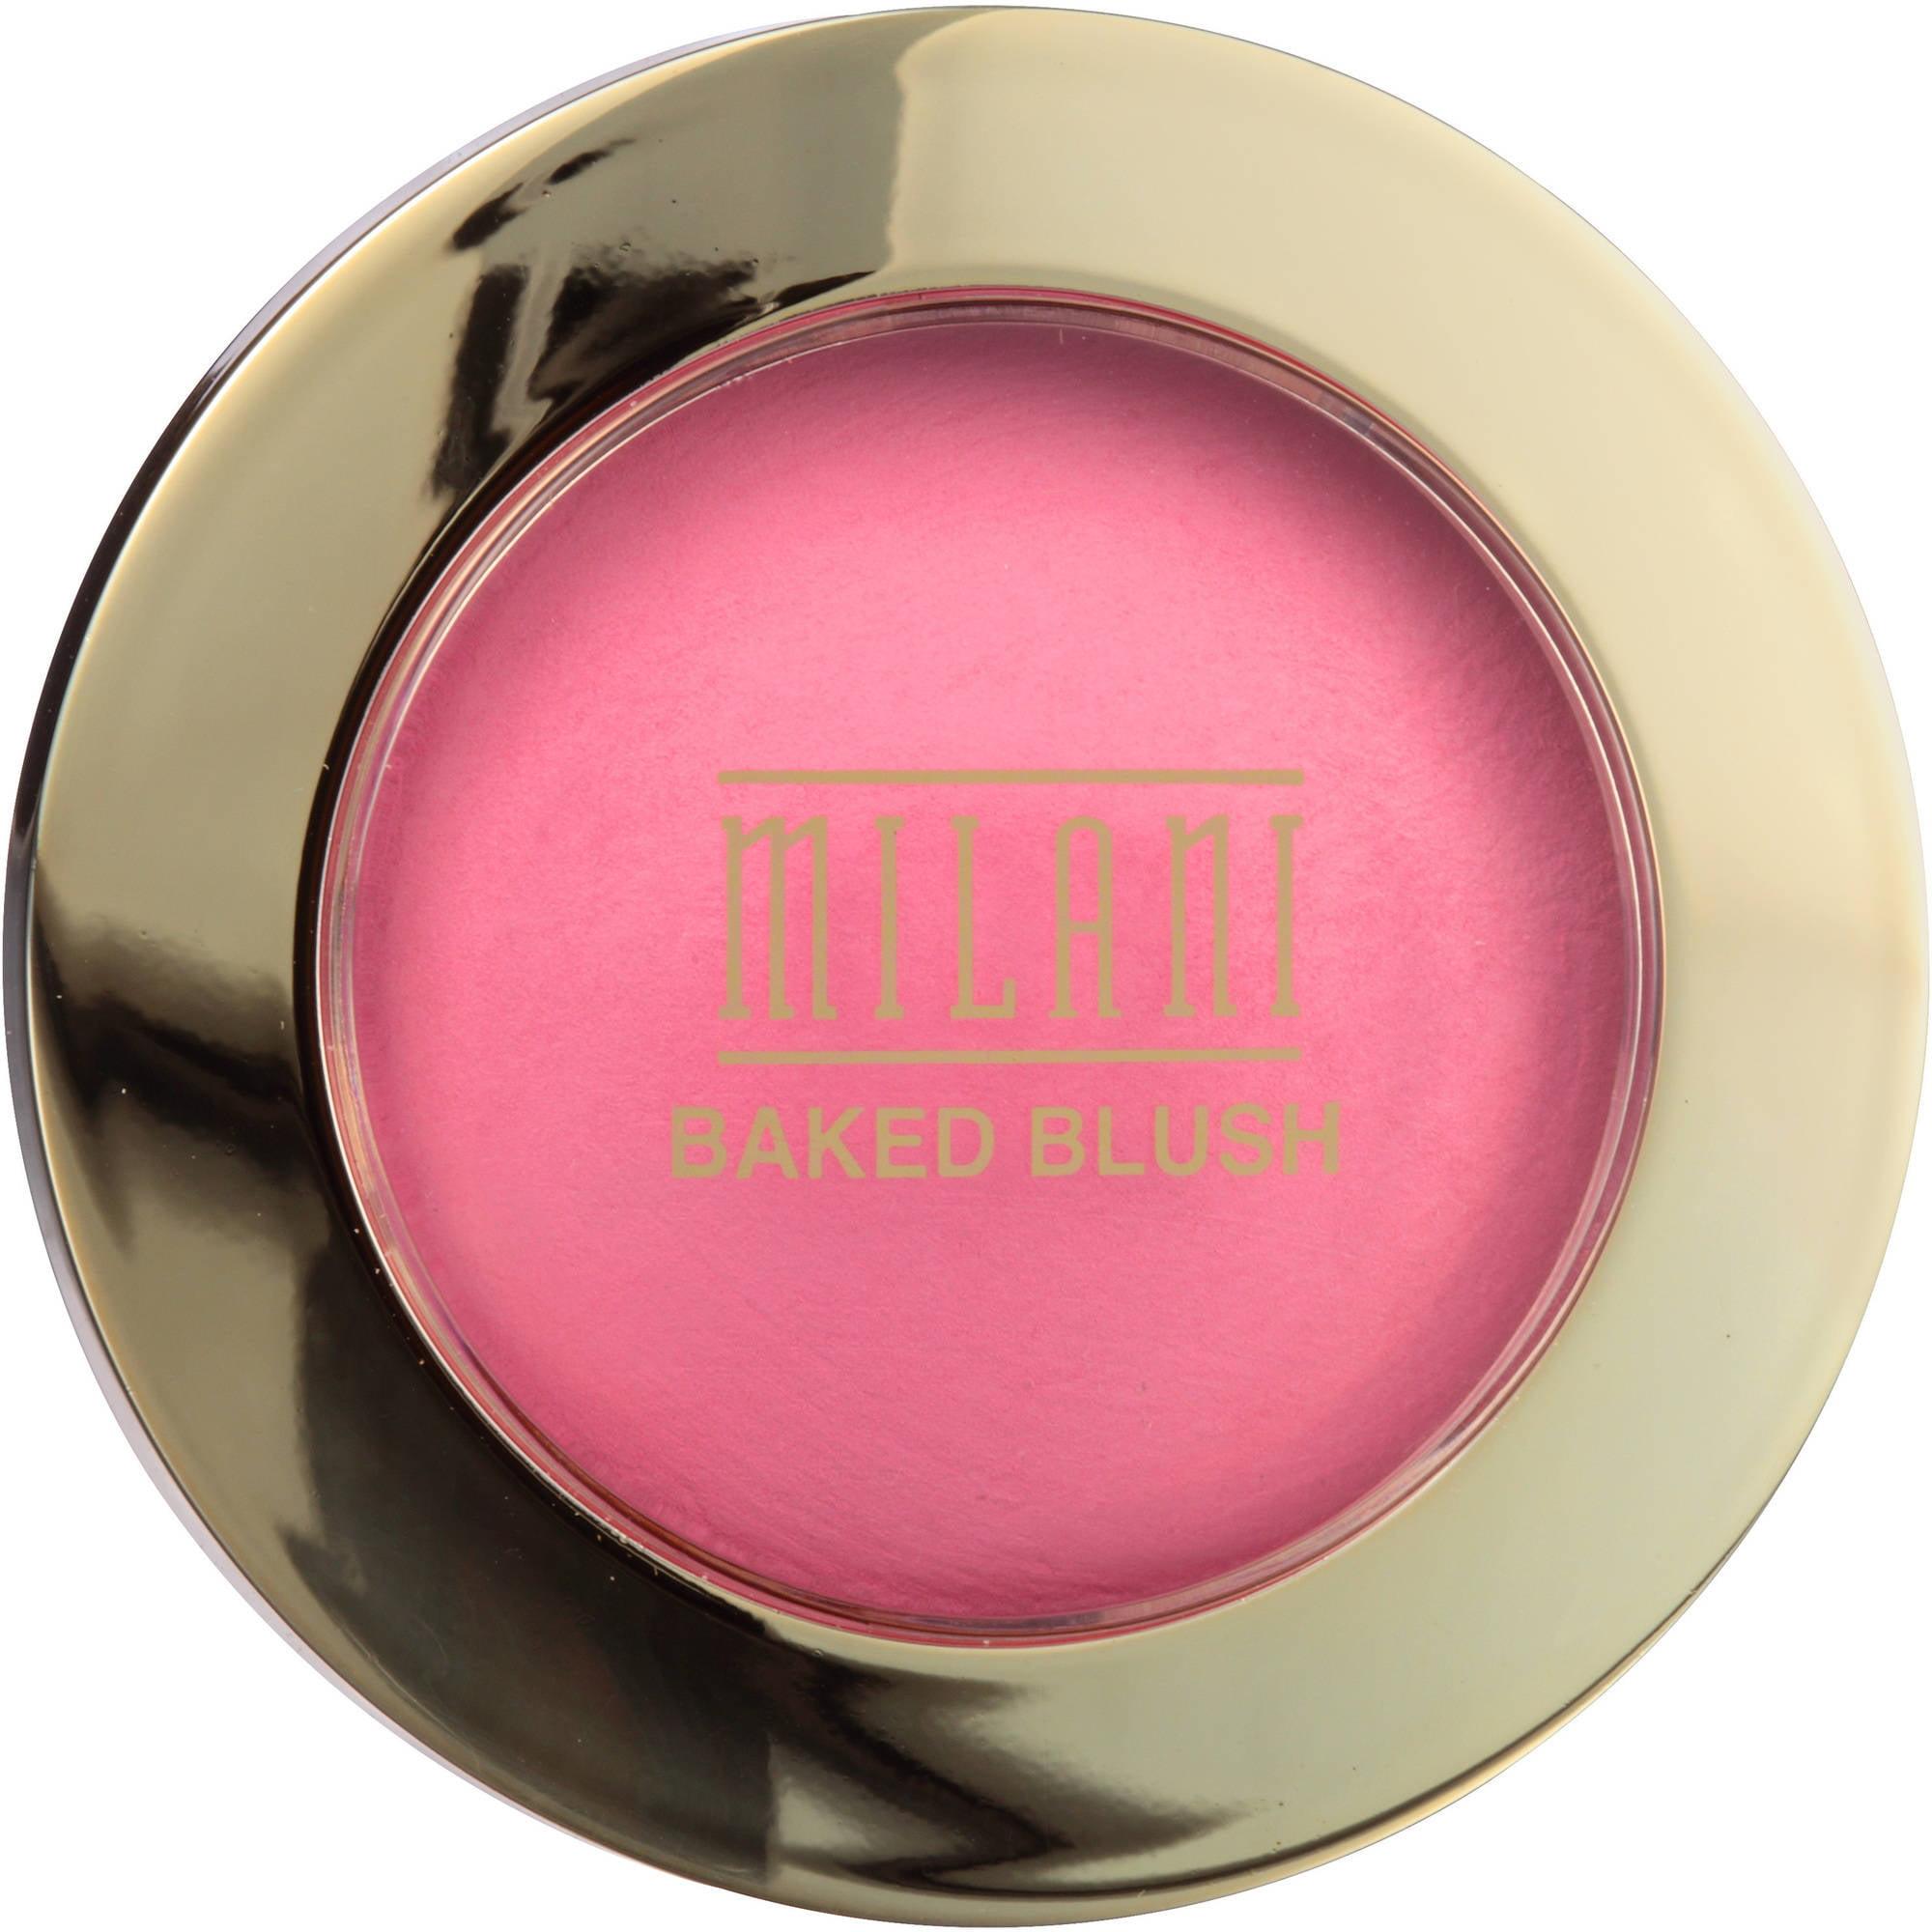 Milani Baked Blush, 10 Delizioso Pink, 0.12 oz